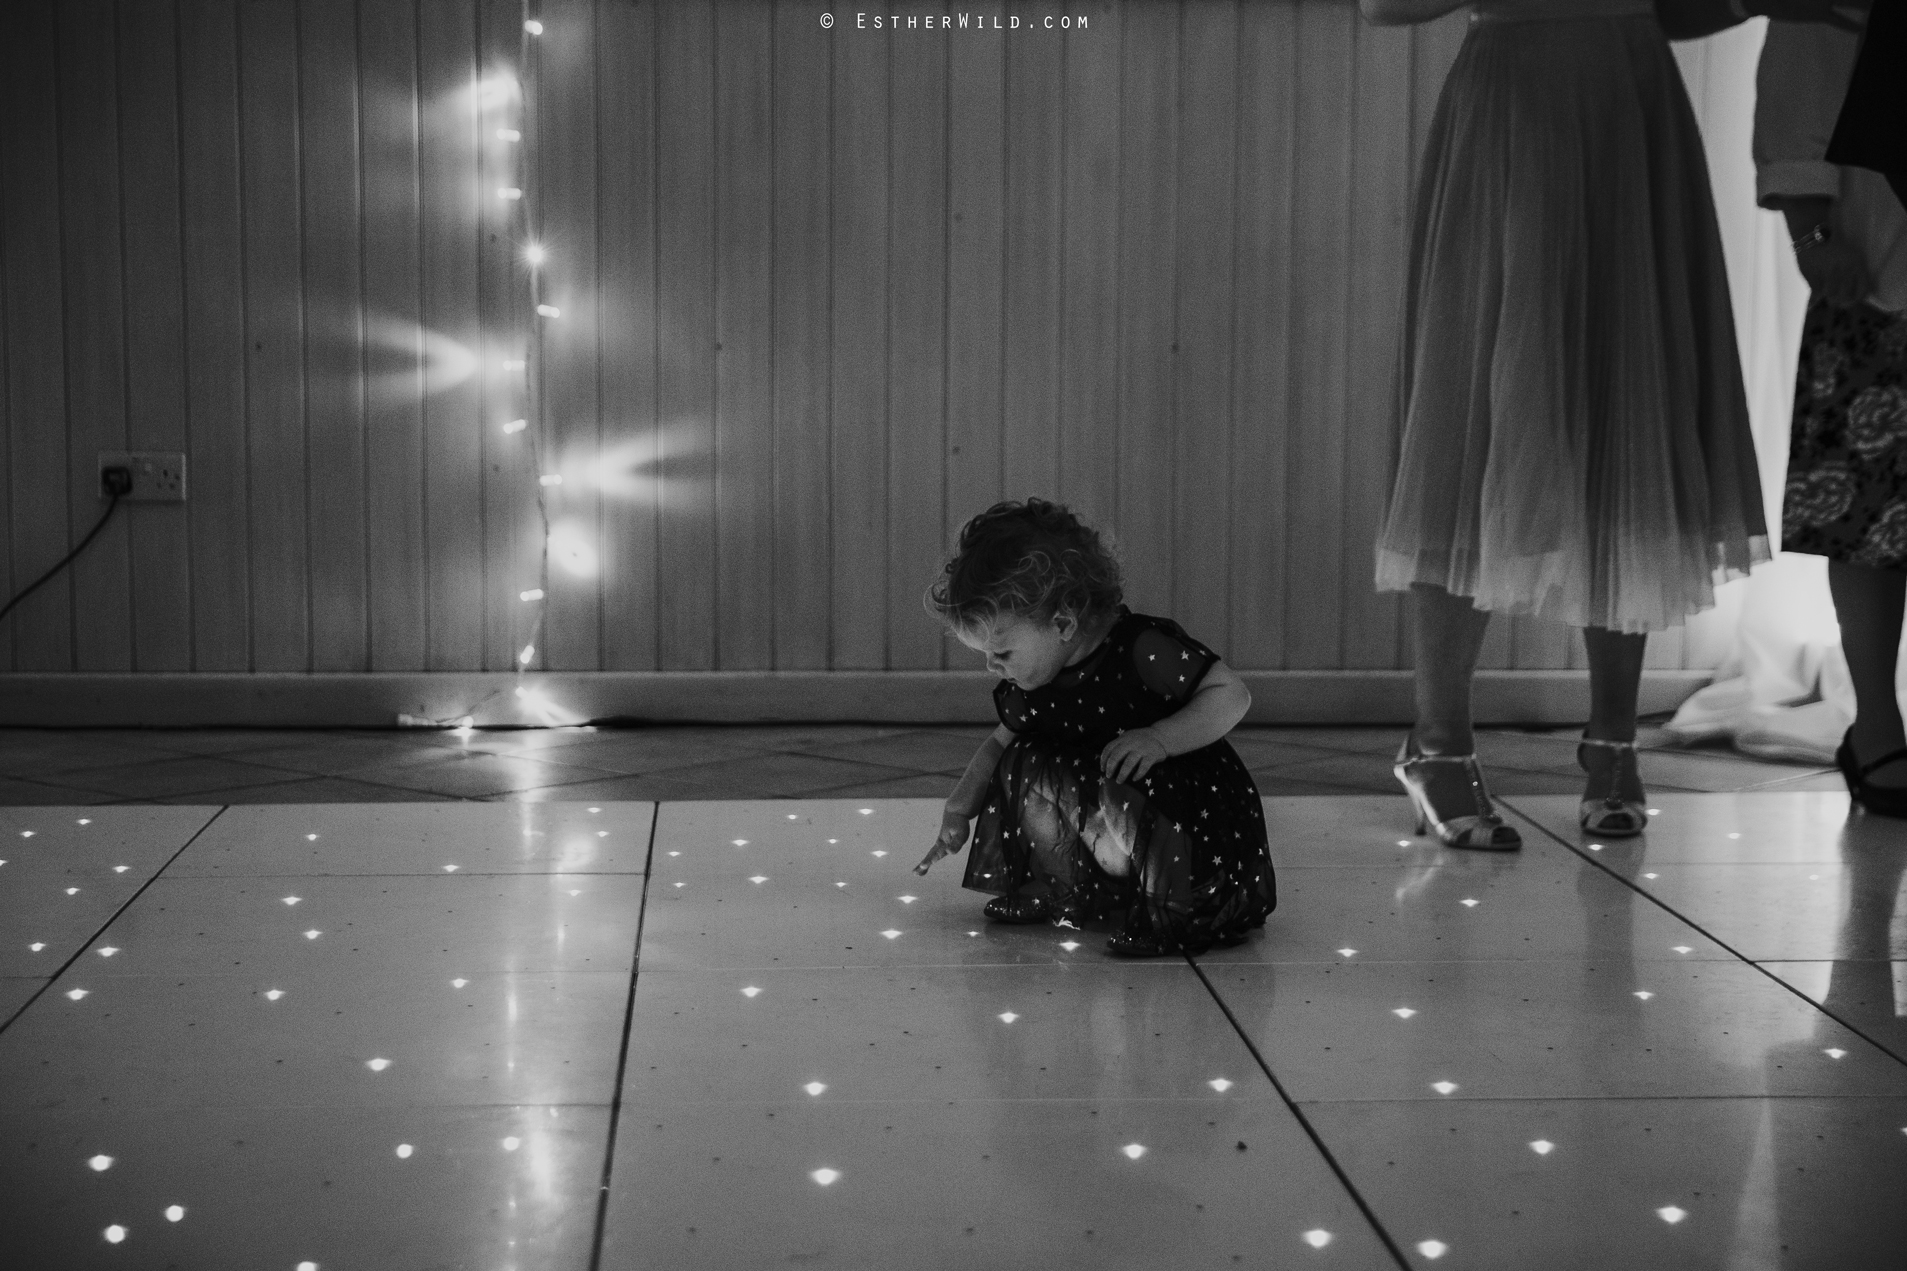 Elms_Barn_Weddings_Suffolk_Photographer_Copyright_Esther_Wild_IMG_3319.jpg